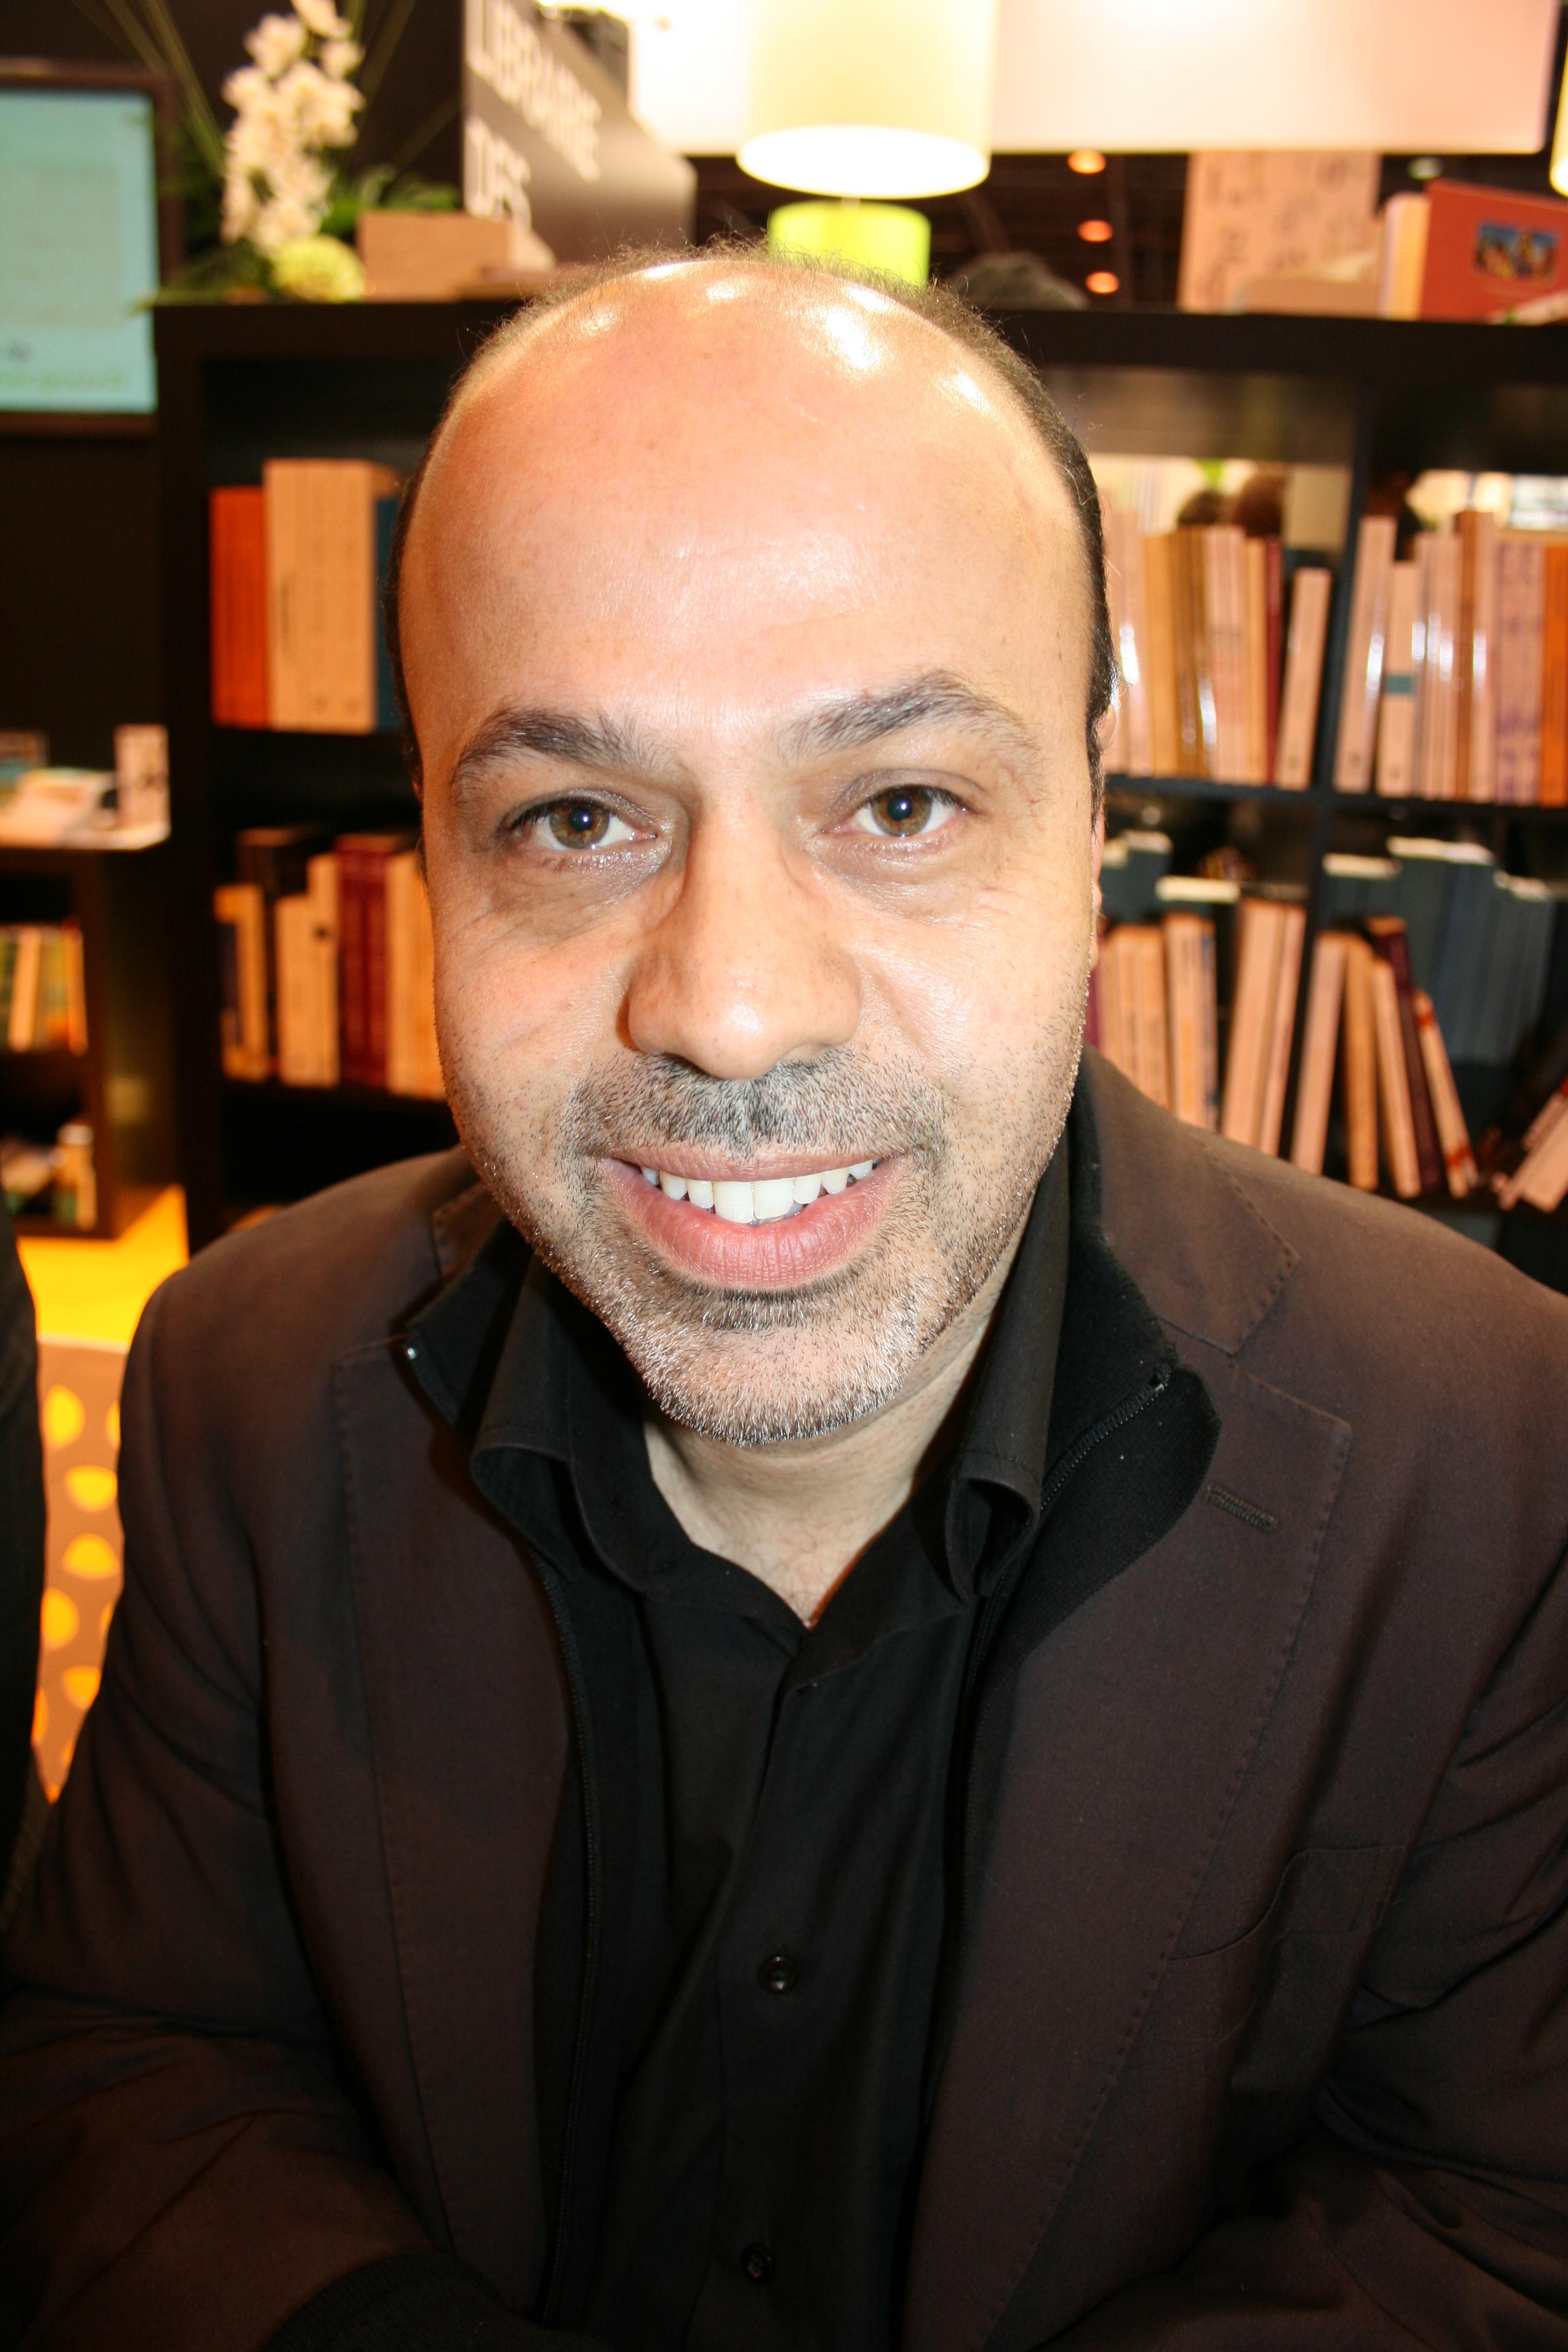 http://upload.wikimedia.org/wikipedia/commons/c/c7/Mohammed-A%C3%AFssaoui-2011.JPG